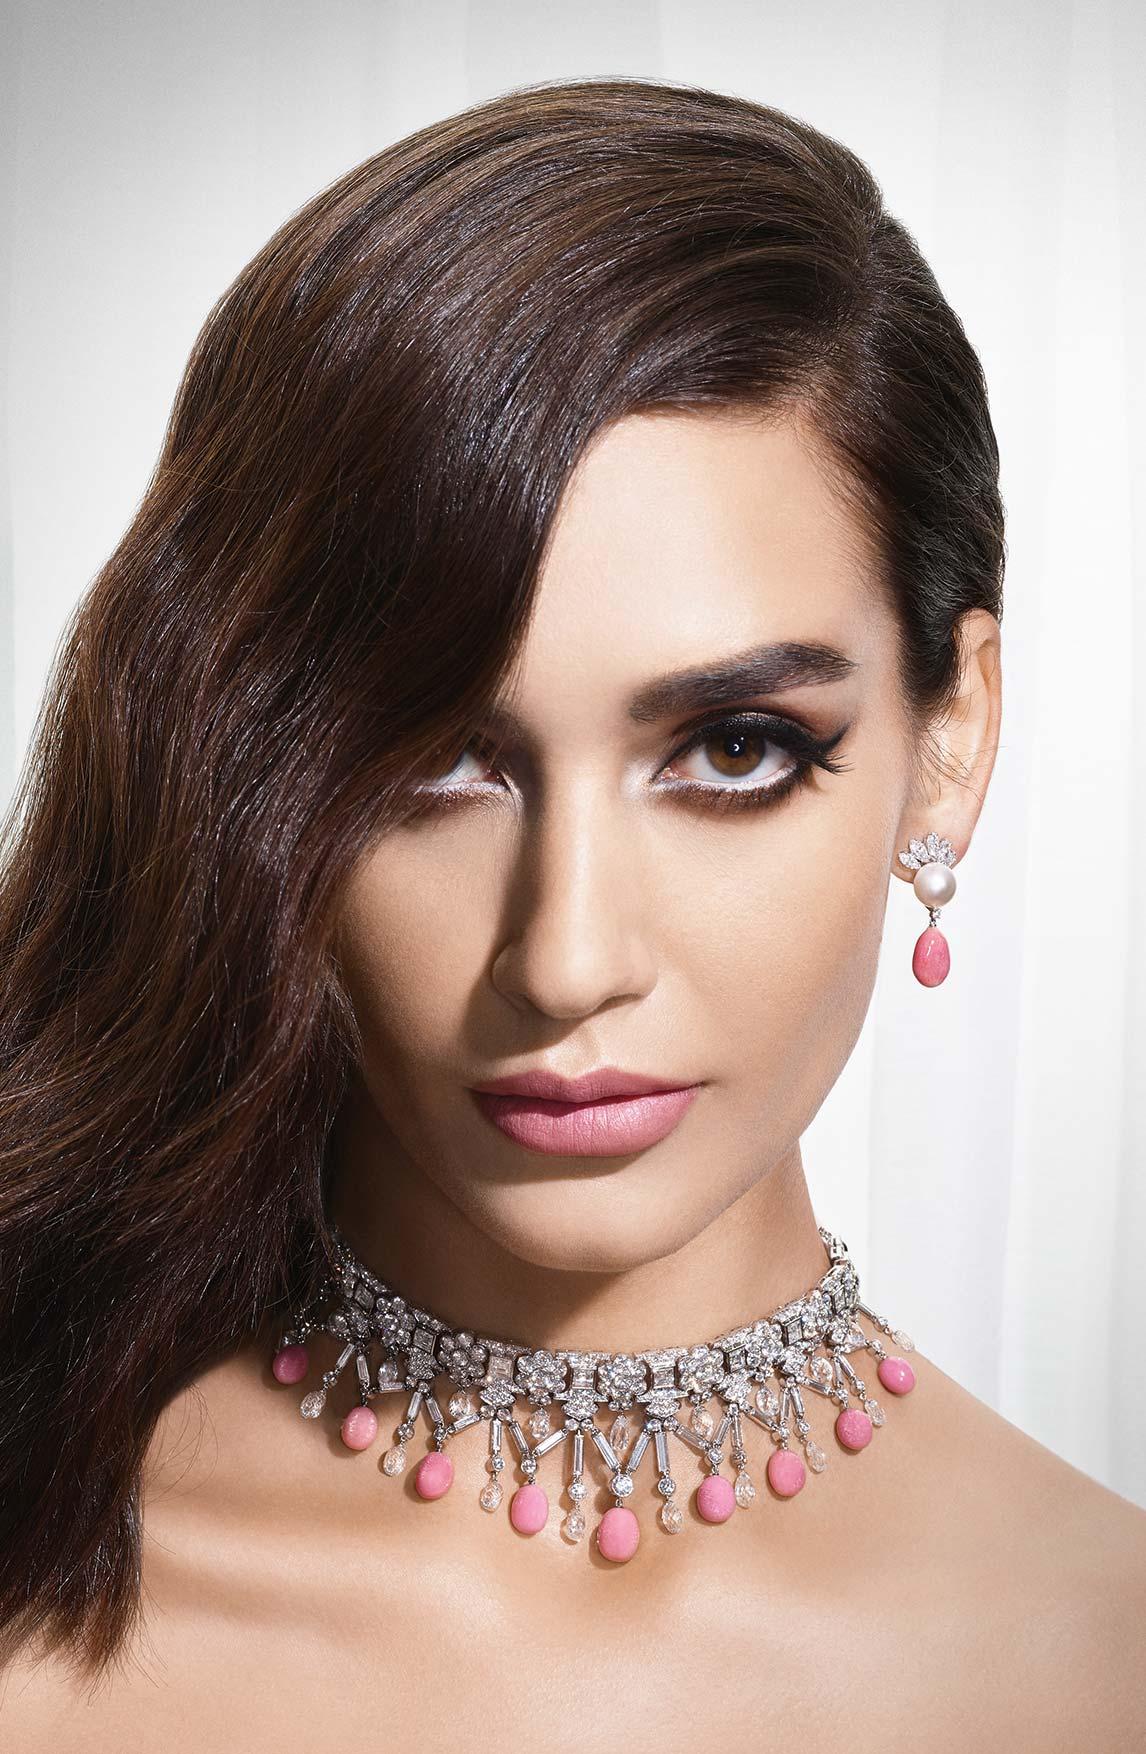 Conch Pearls Jewellery 01 | Maria Gaspari